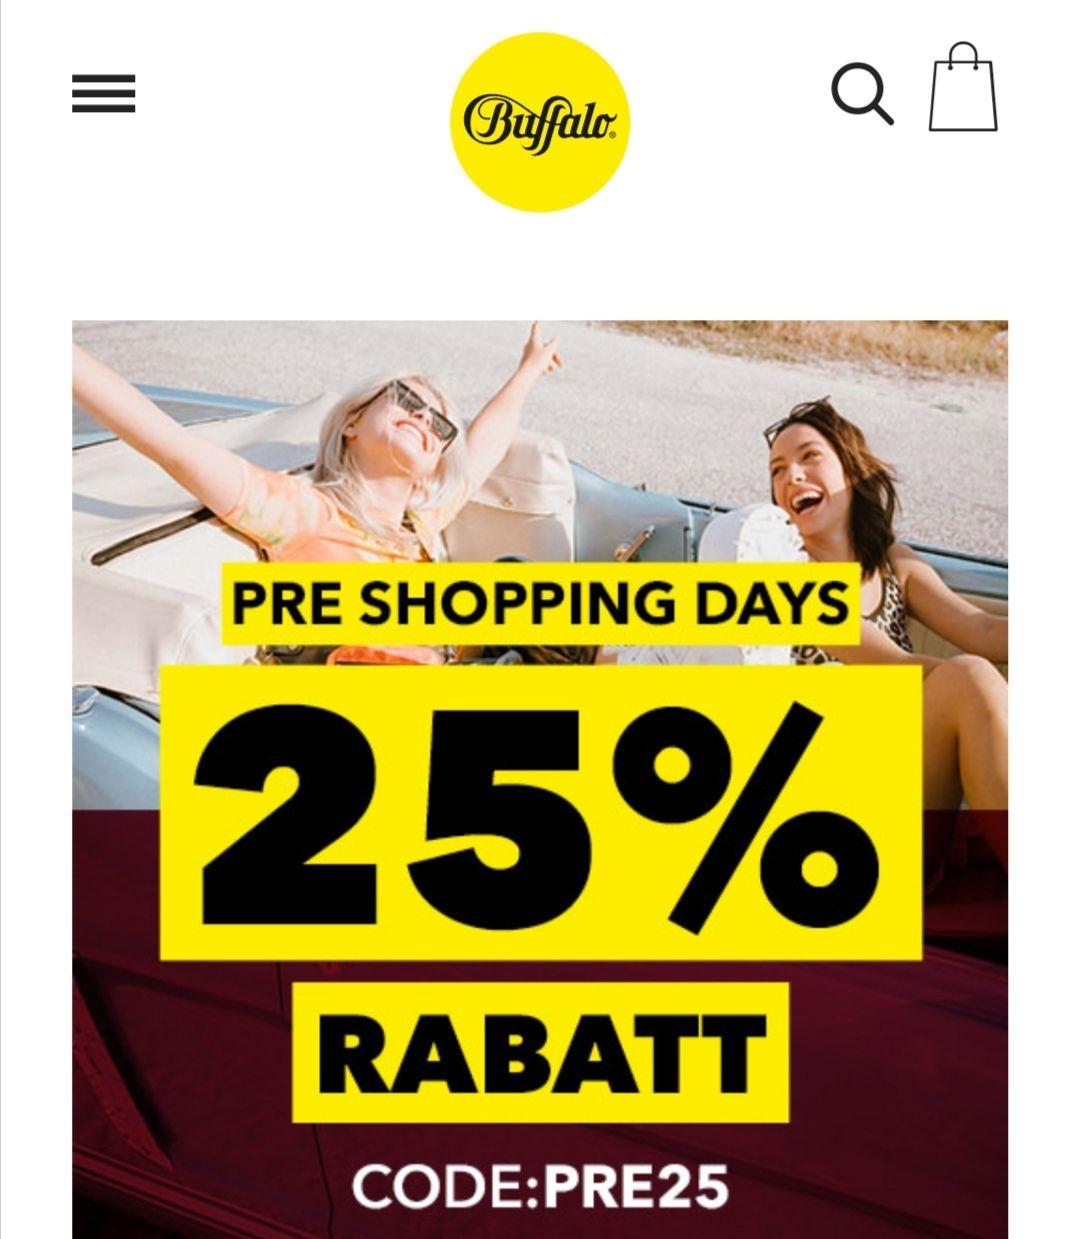 25% Rabatt - Pre Shopping Days bei Buffalo